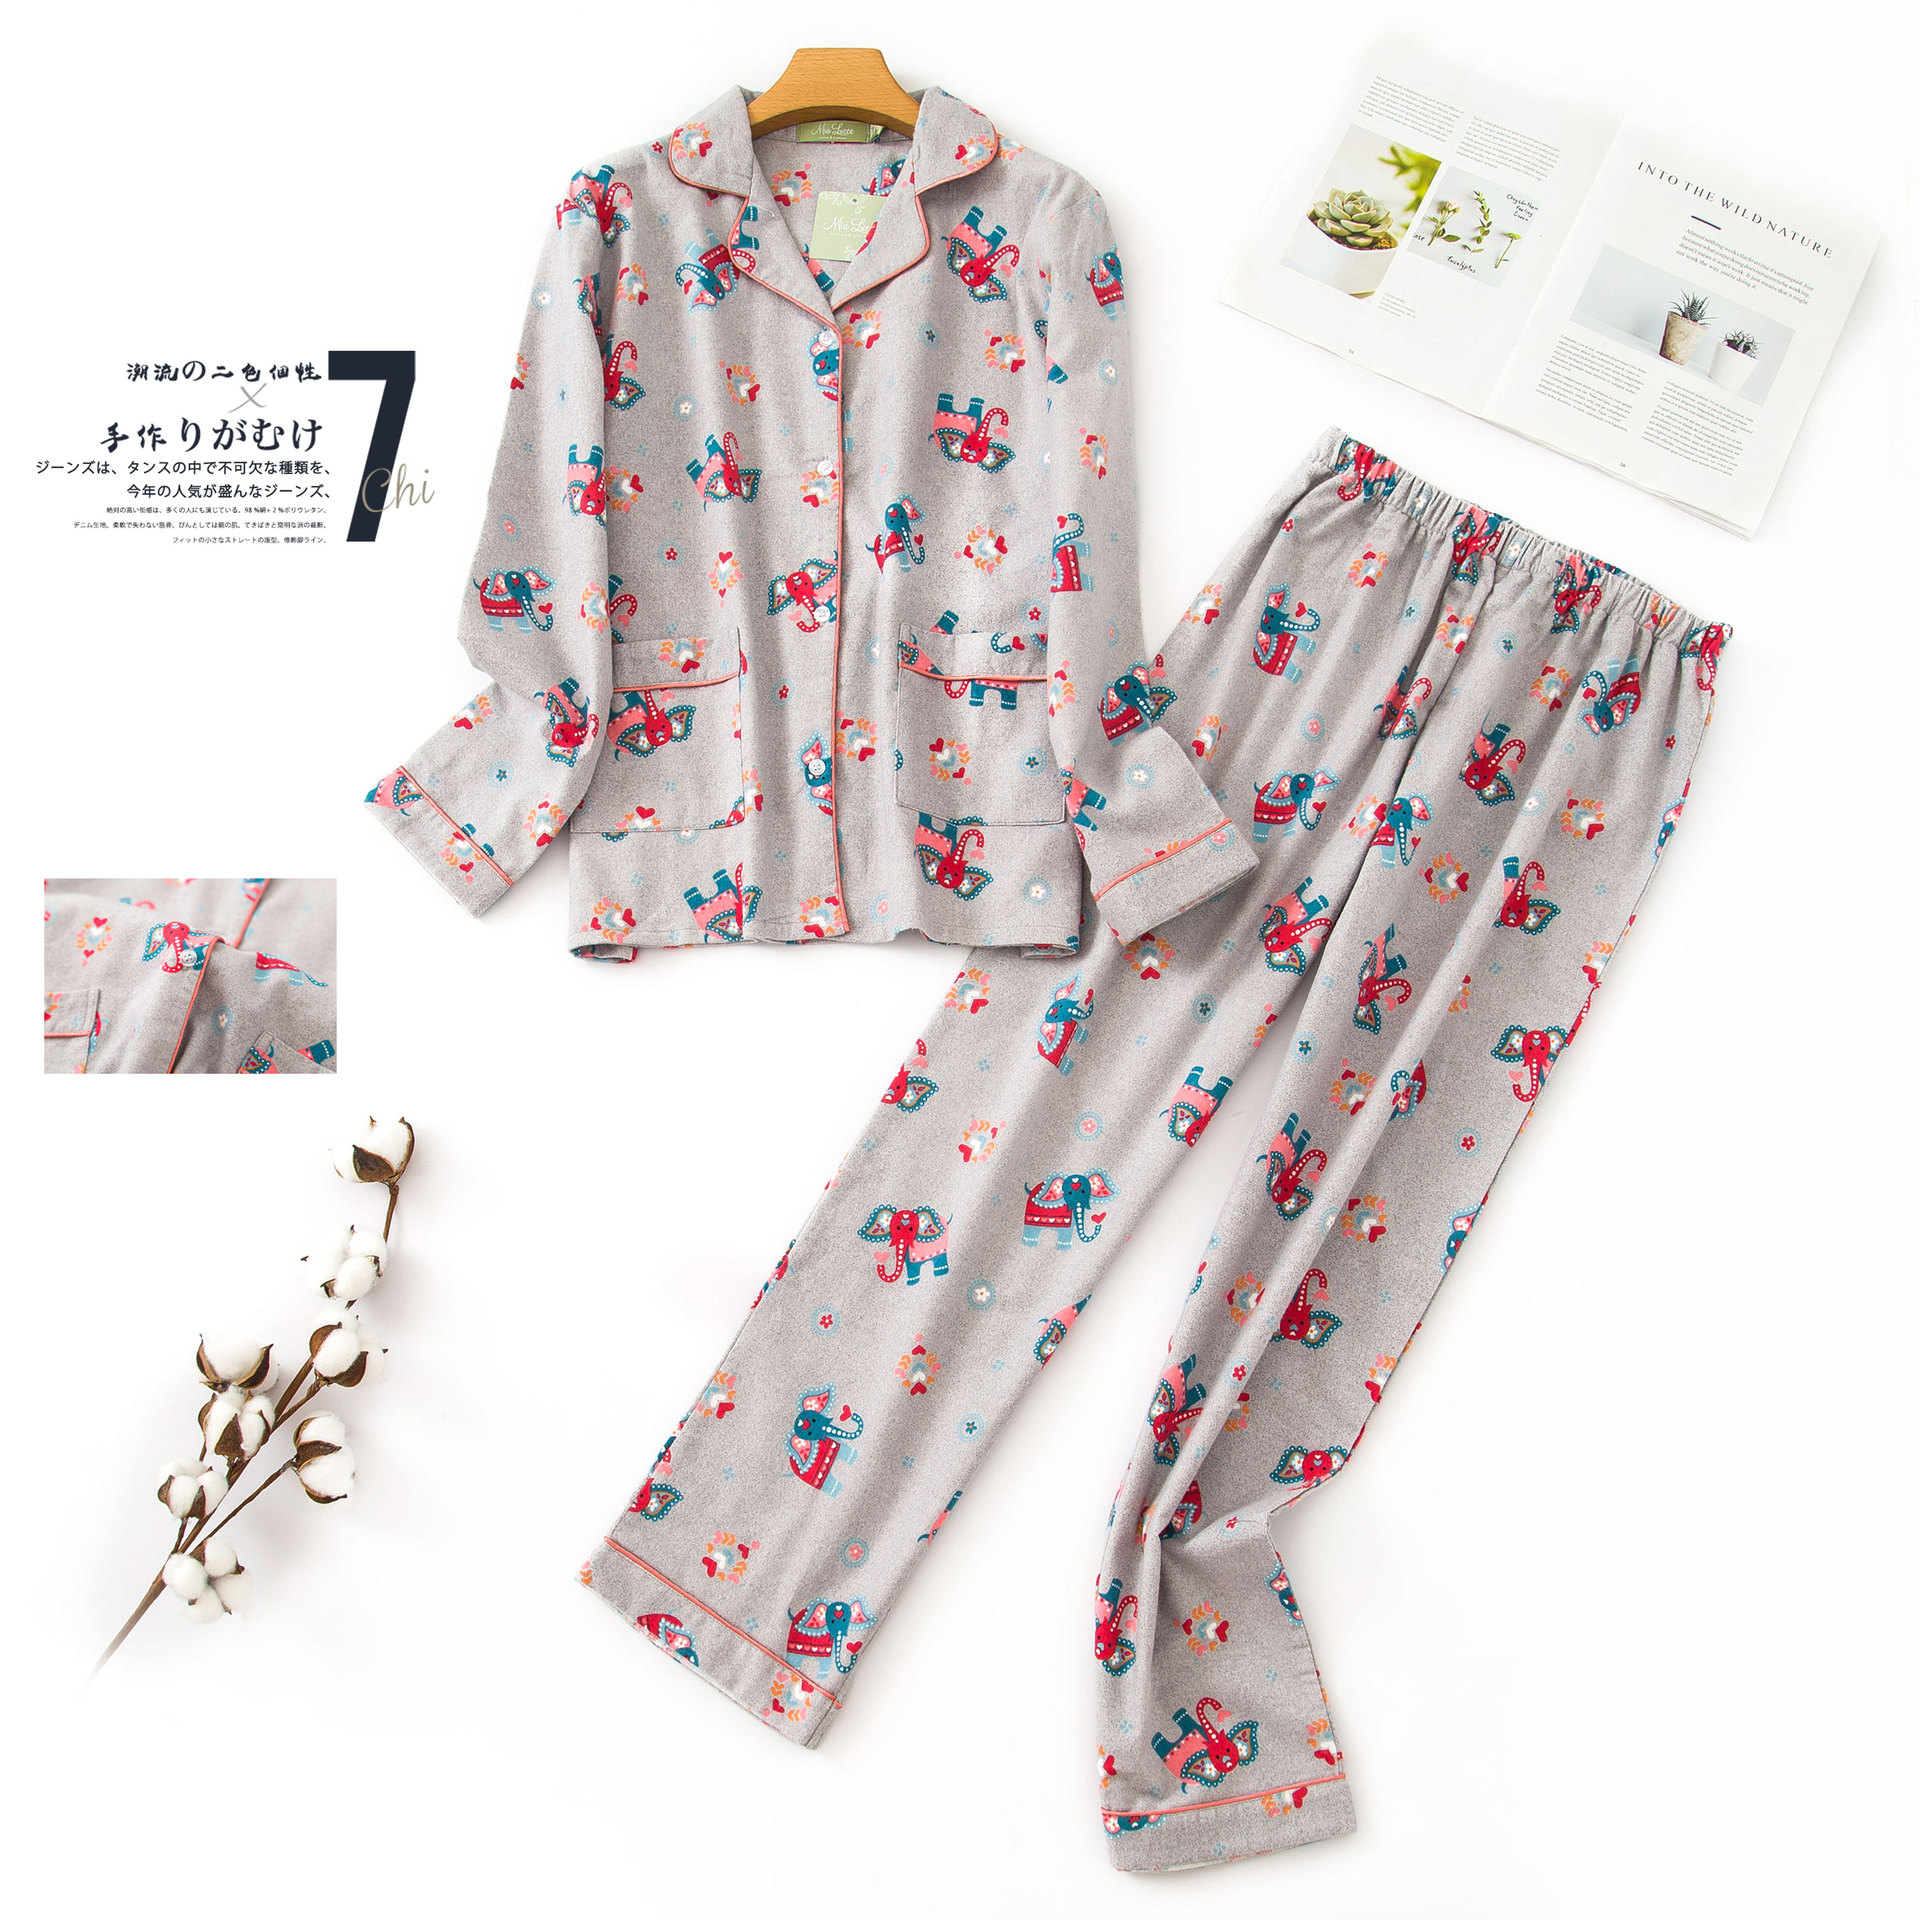 Women Winter Korean Long Sleeves Cotton Pajamas Set Lovely Casual Comfortable Cartoon Pijamas Plus Size Sleepwear Home Clothes